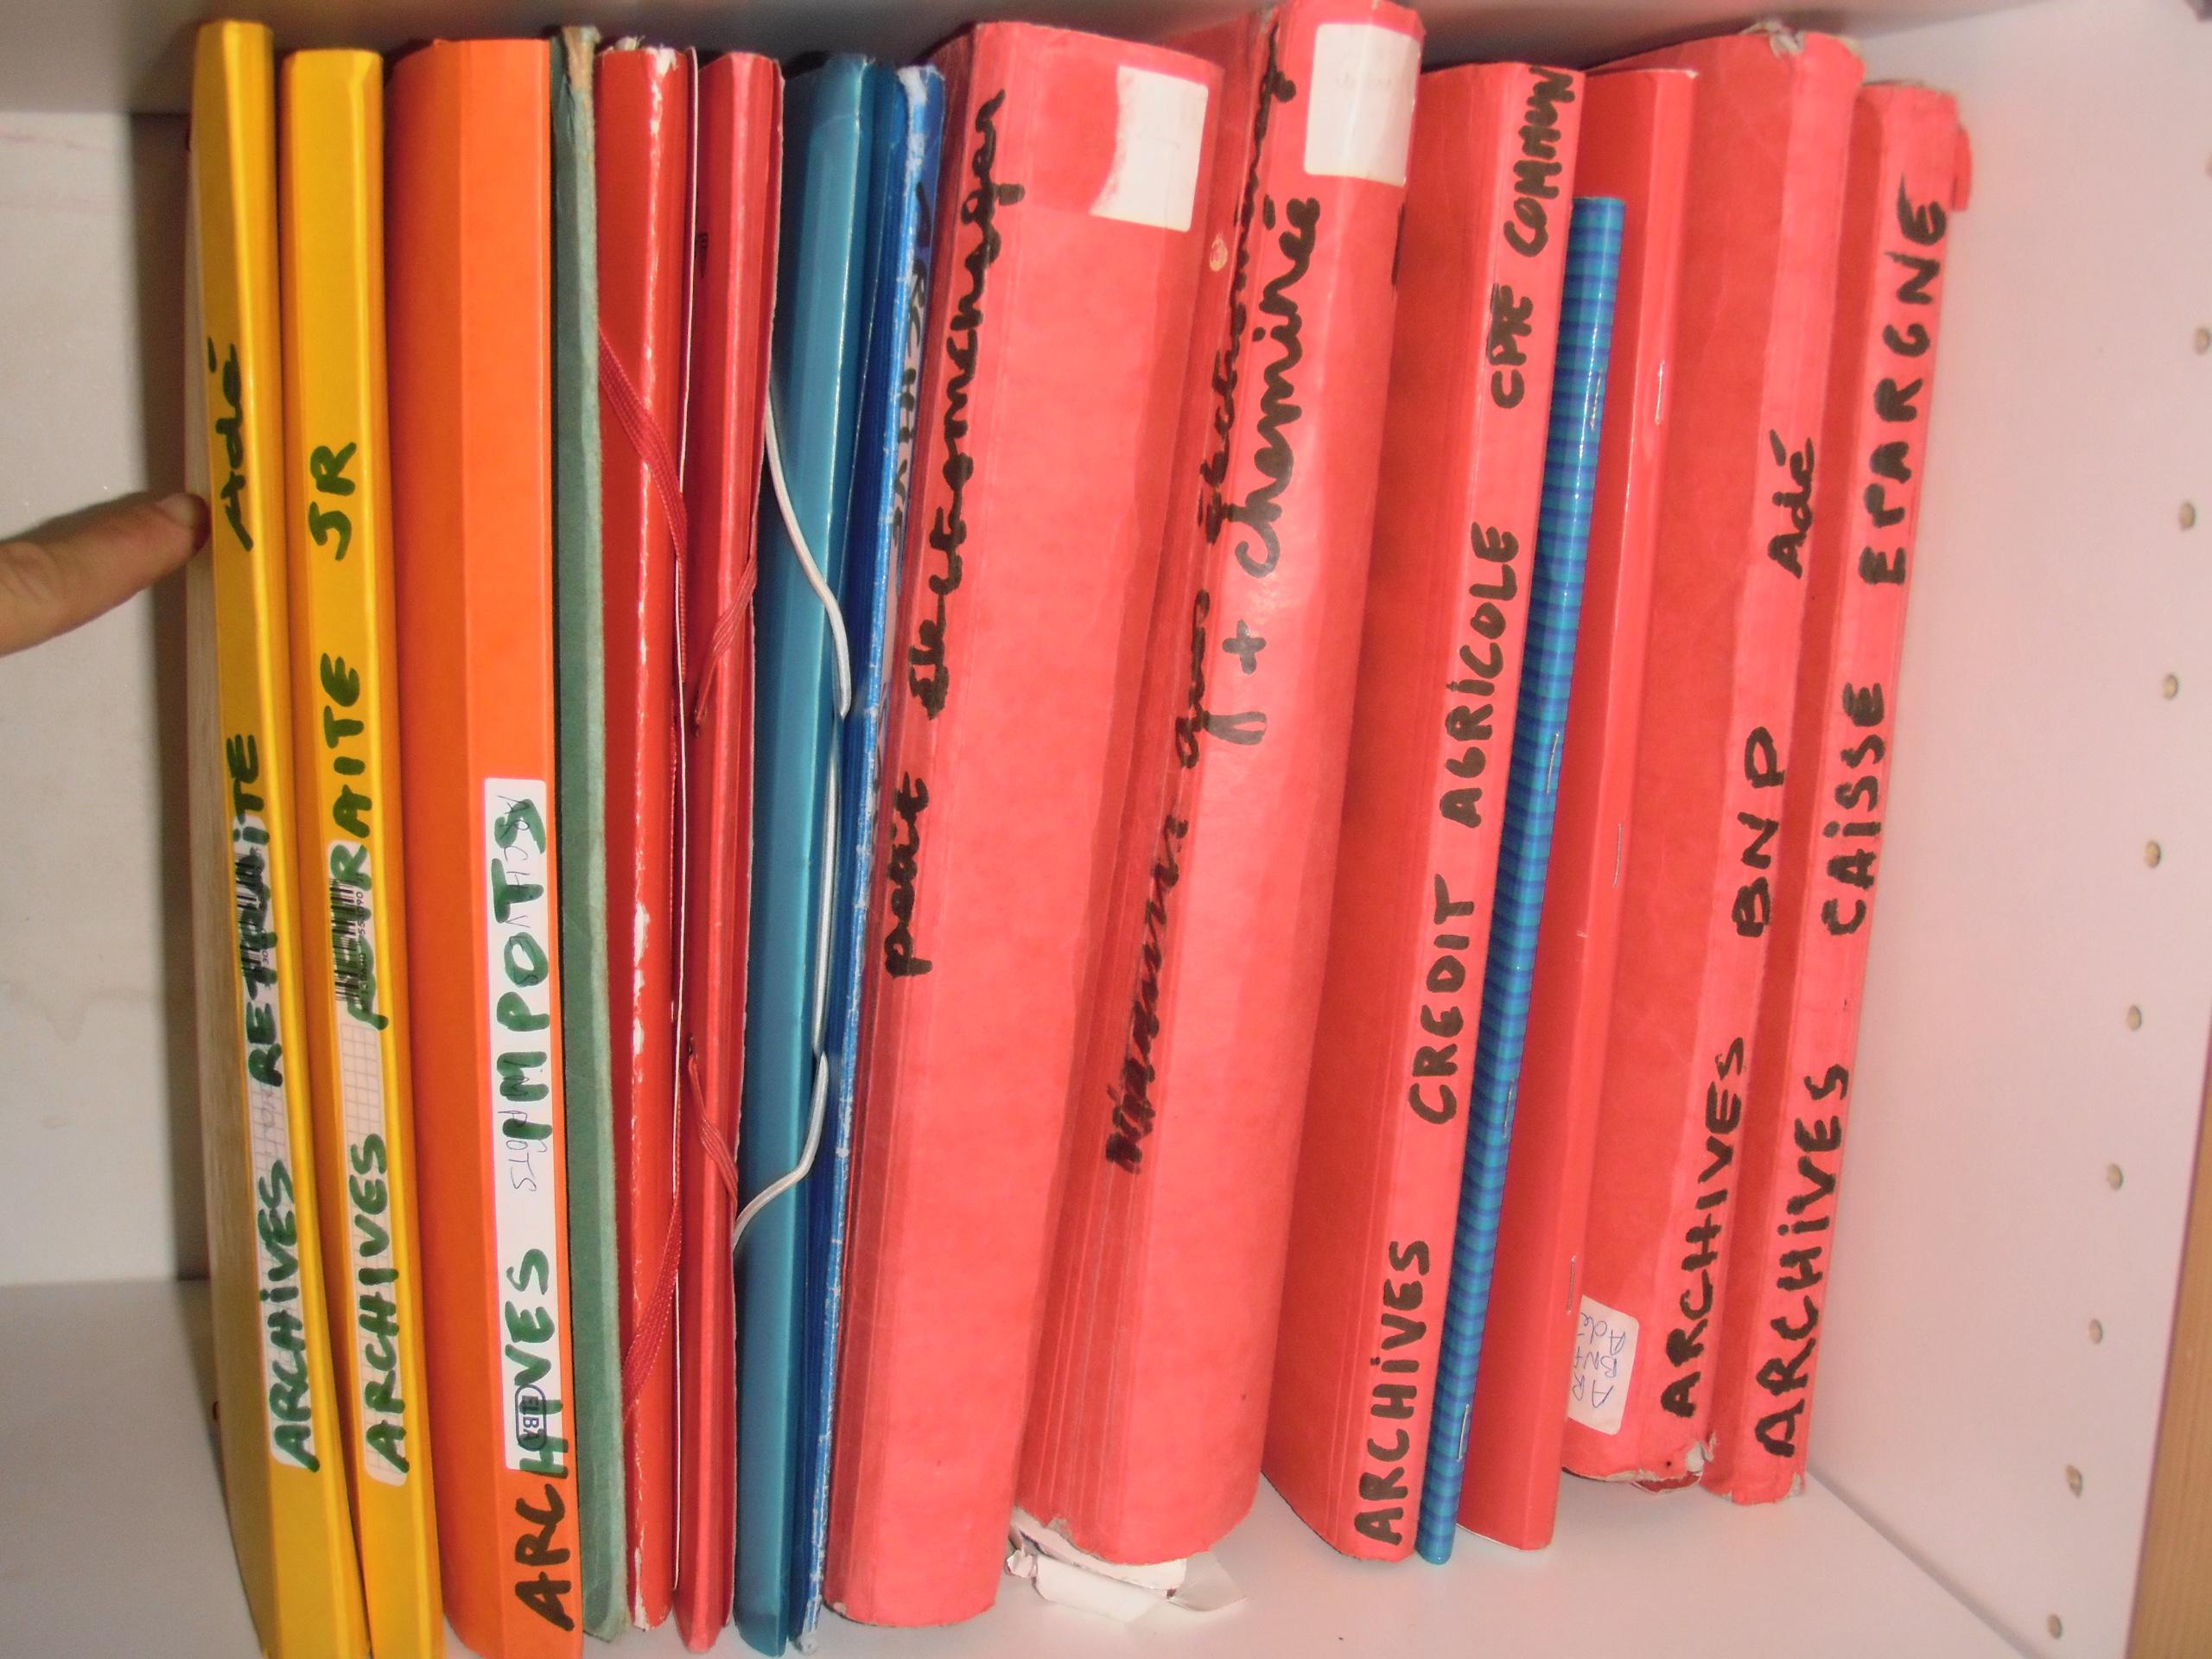 rangement papier administratif maison | champagneandbeyond1